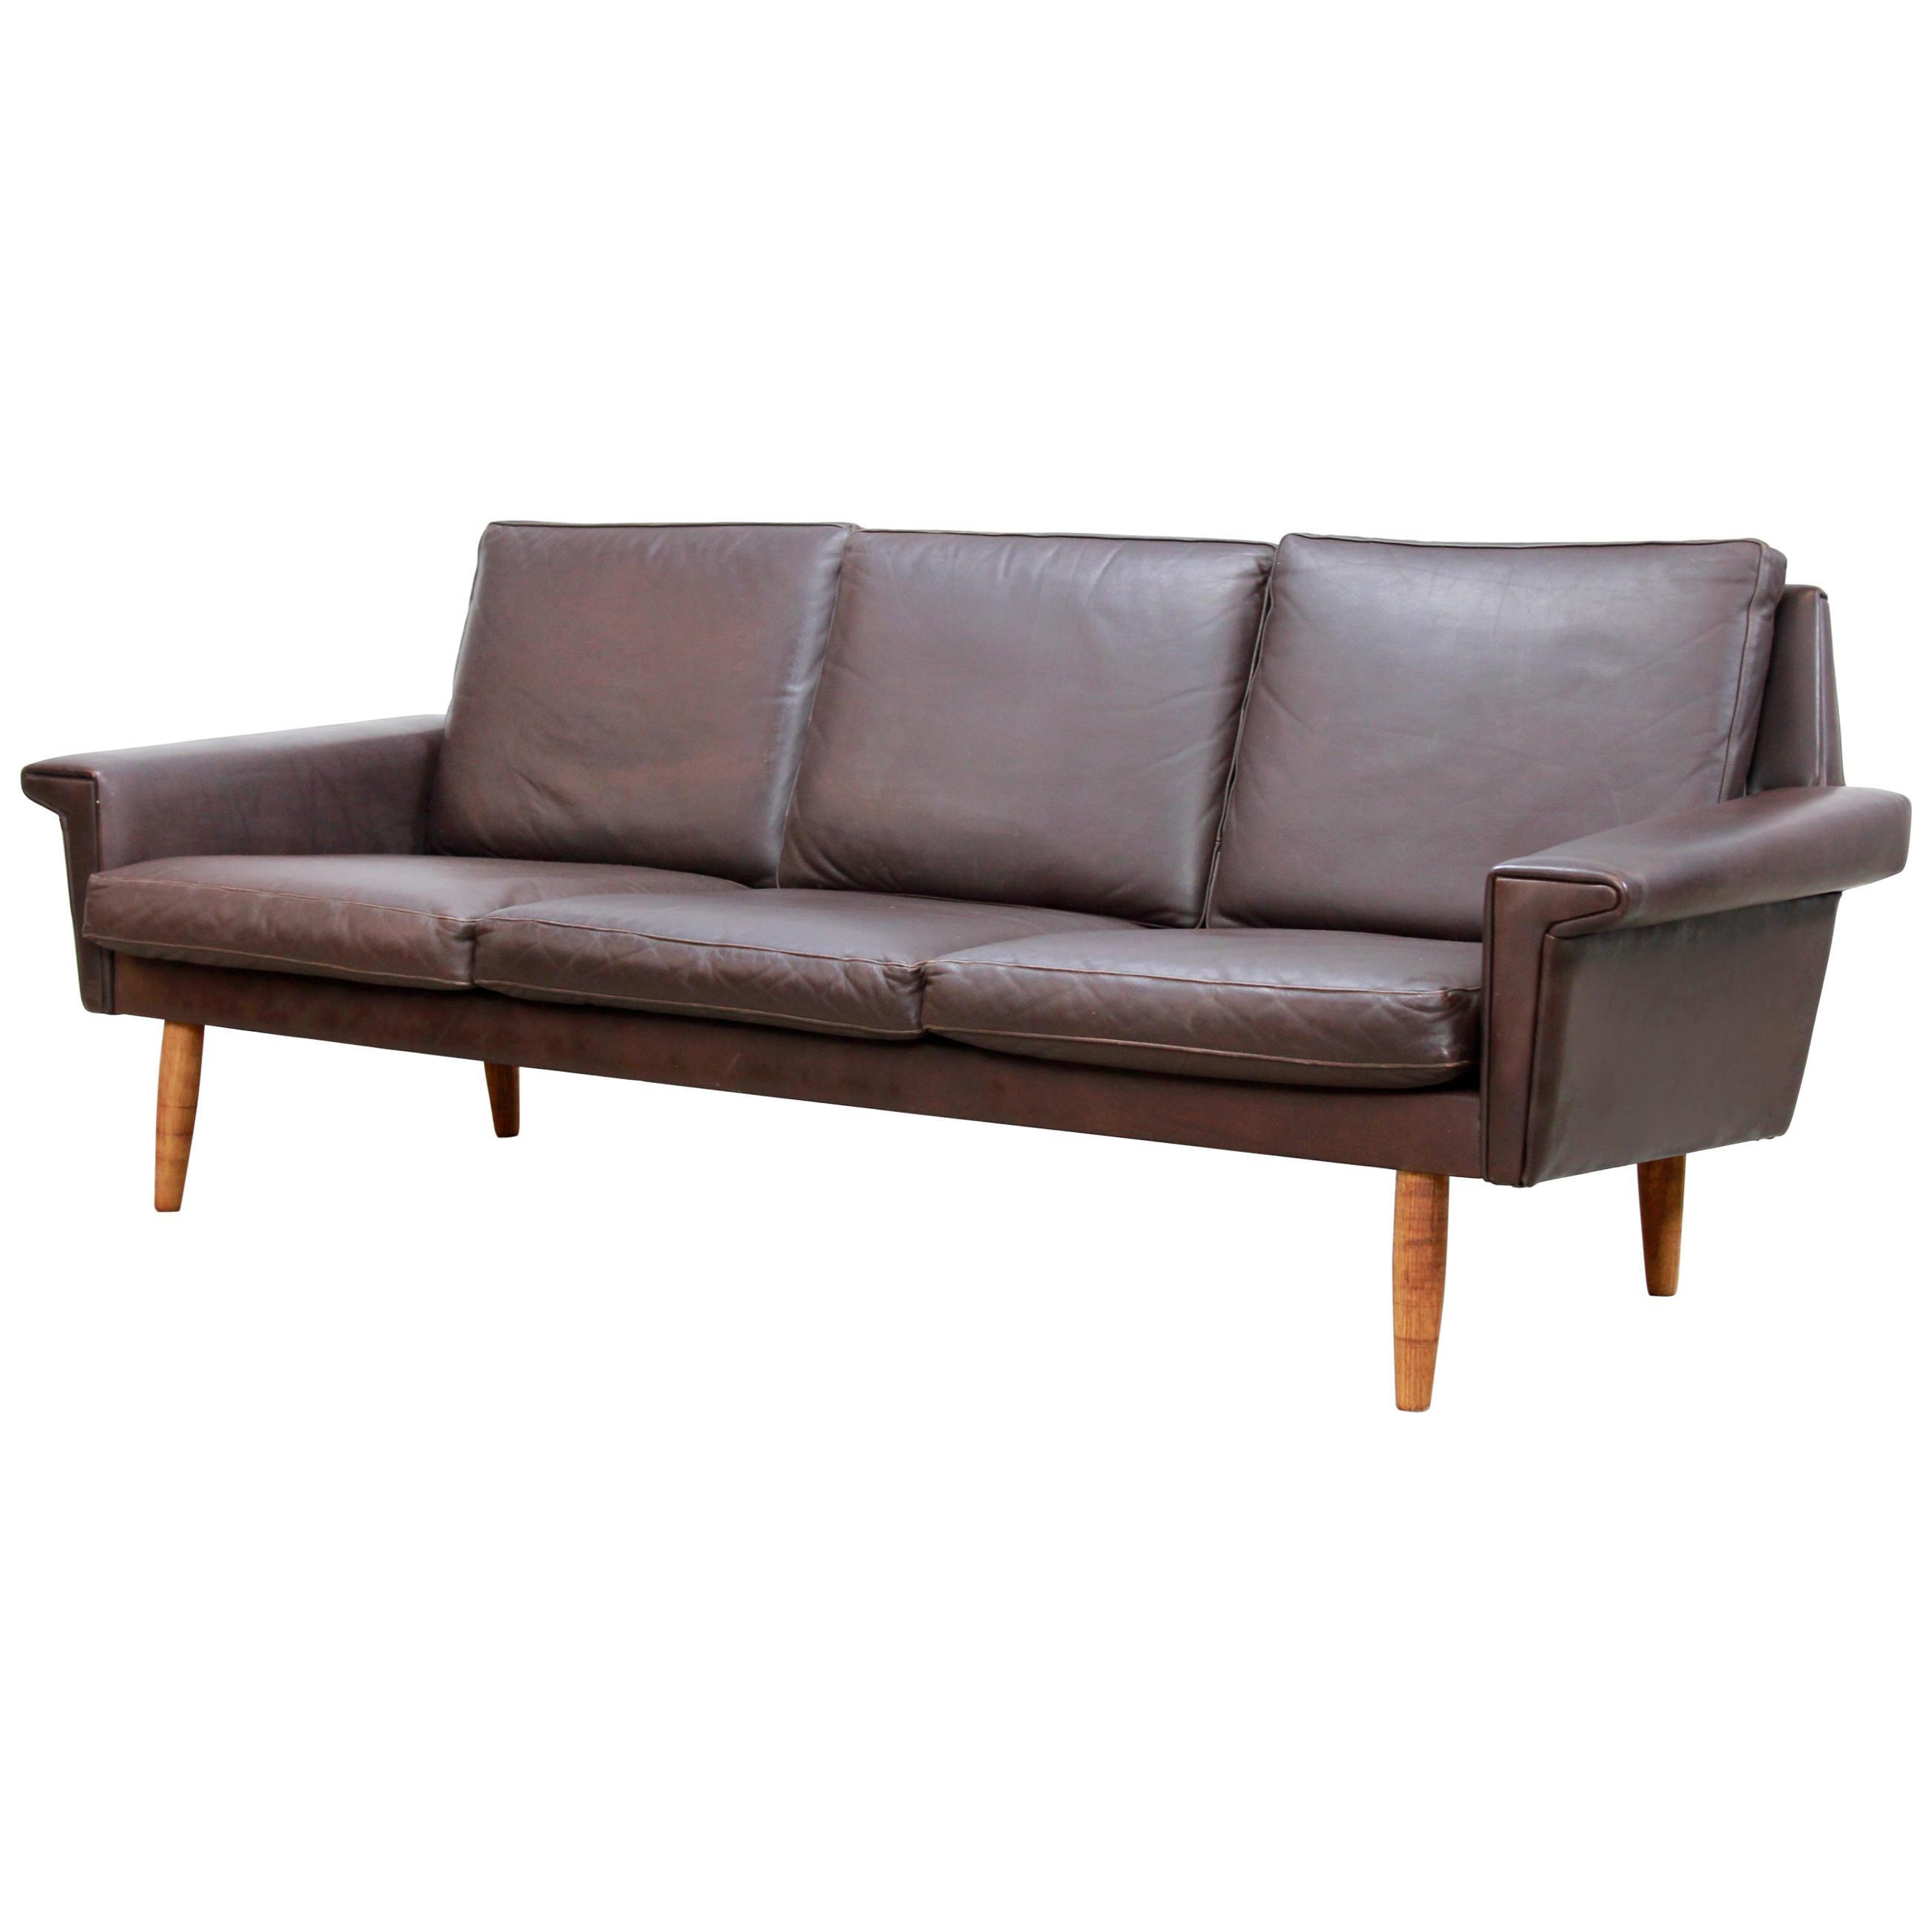 Danish Dark Brown Leather Three-Seat Sofa by Vejen Polstermøbelfabrik, 1960